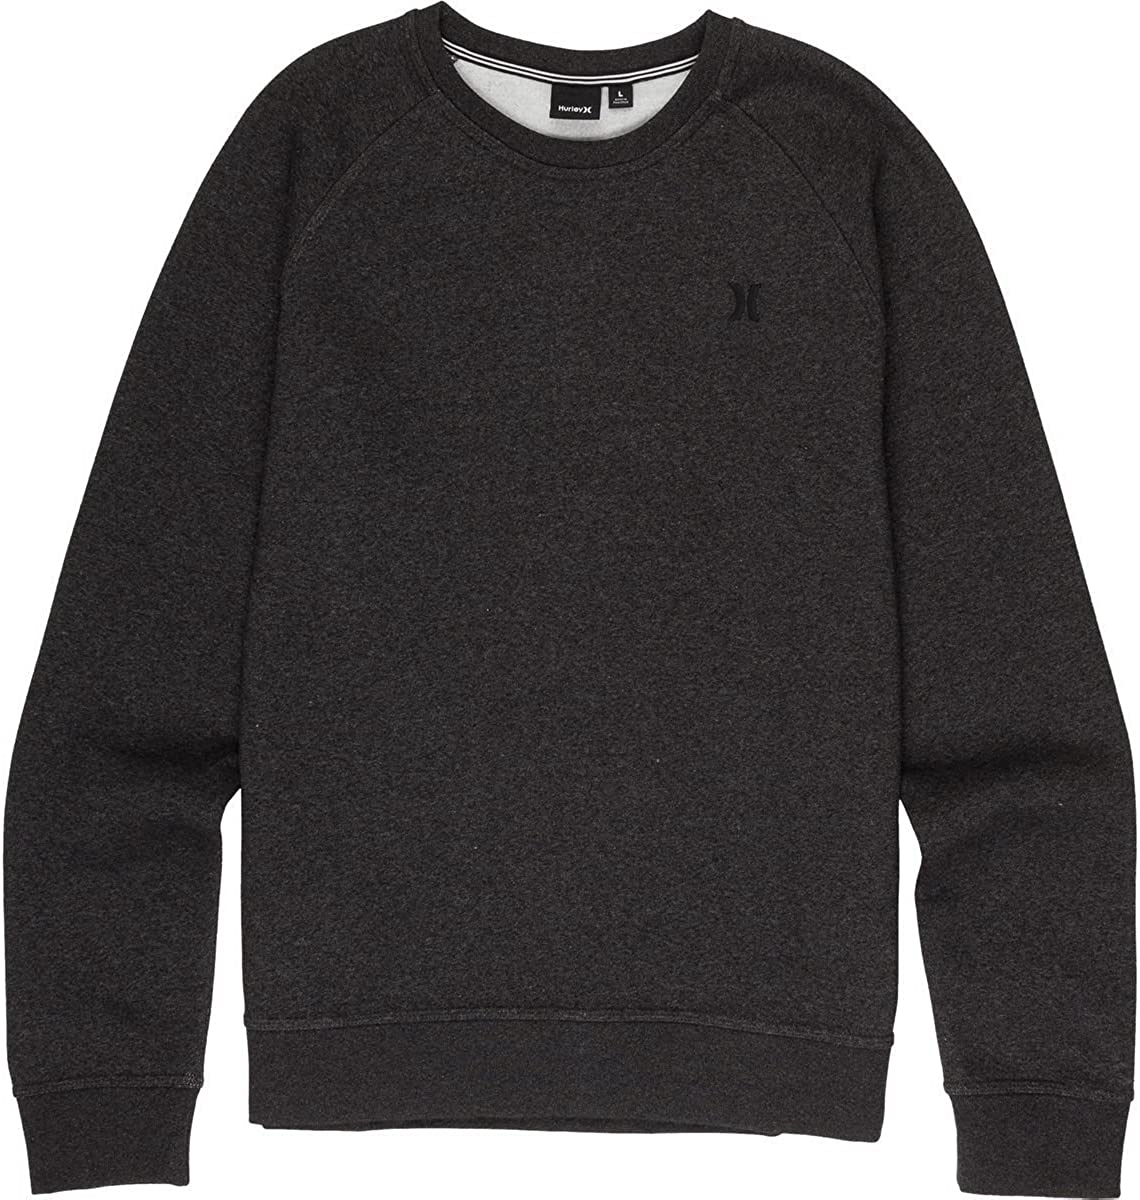 Hurley Mens Getaway 2.0 Pullover Sweater